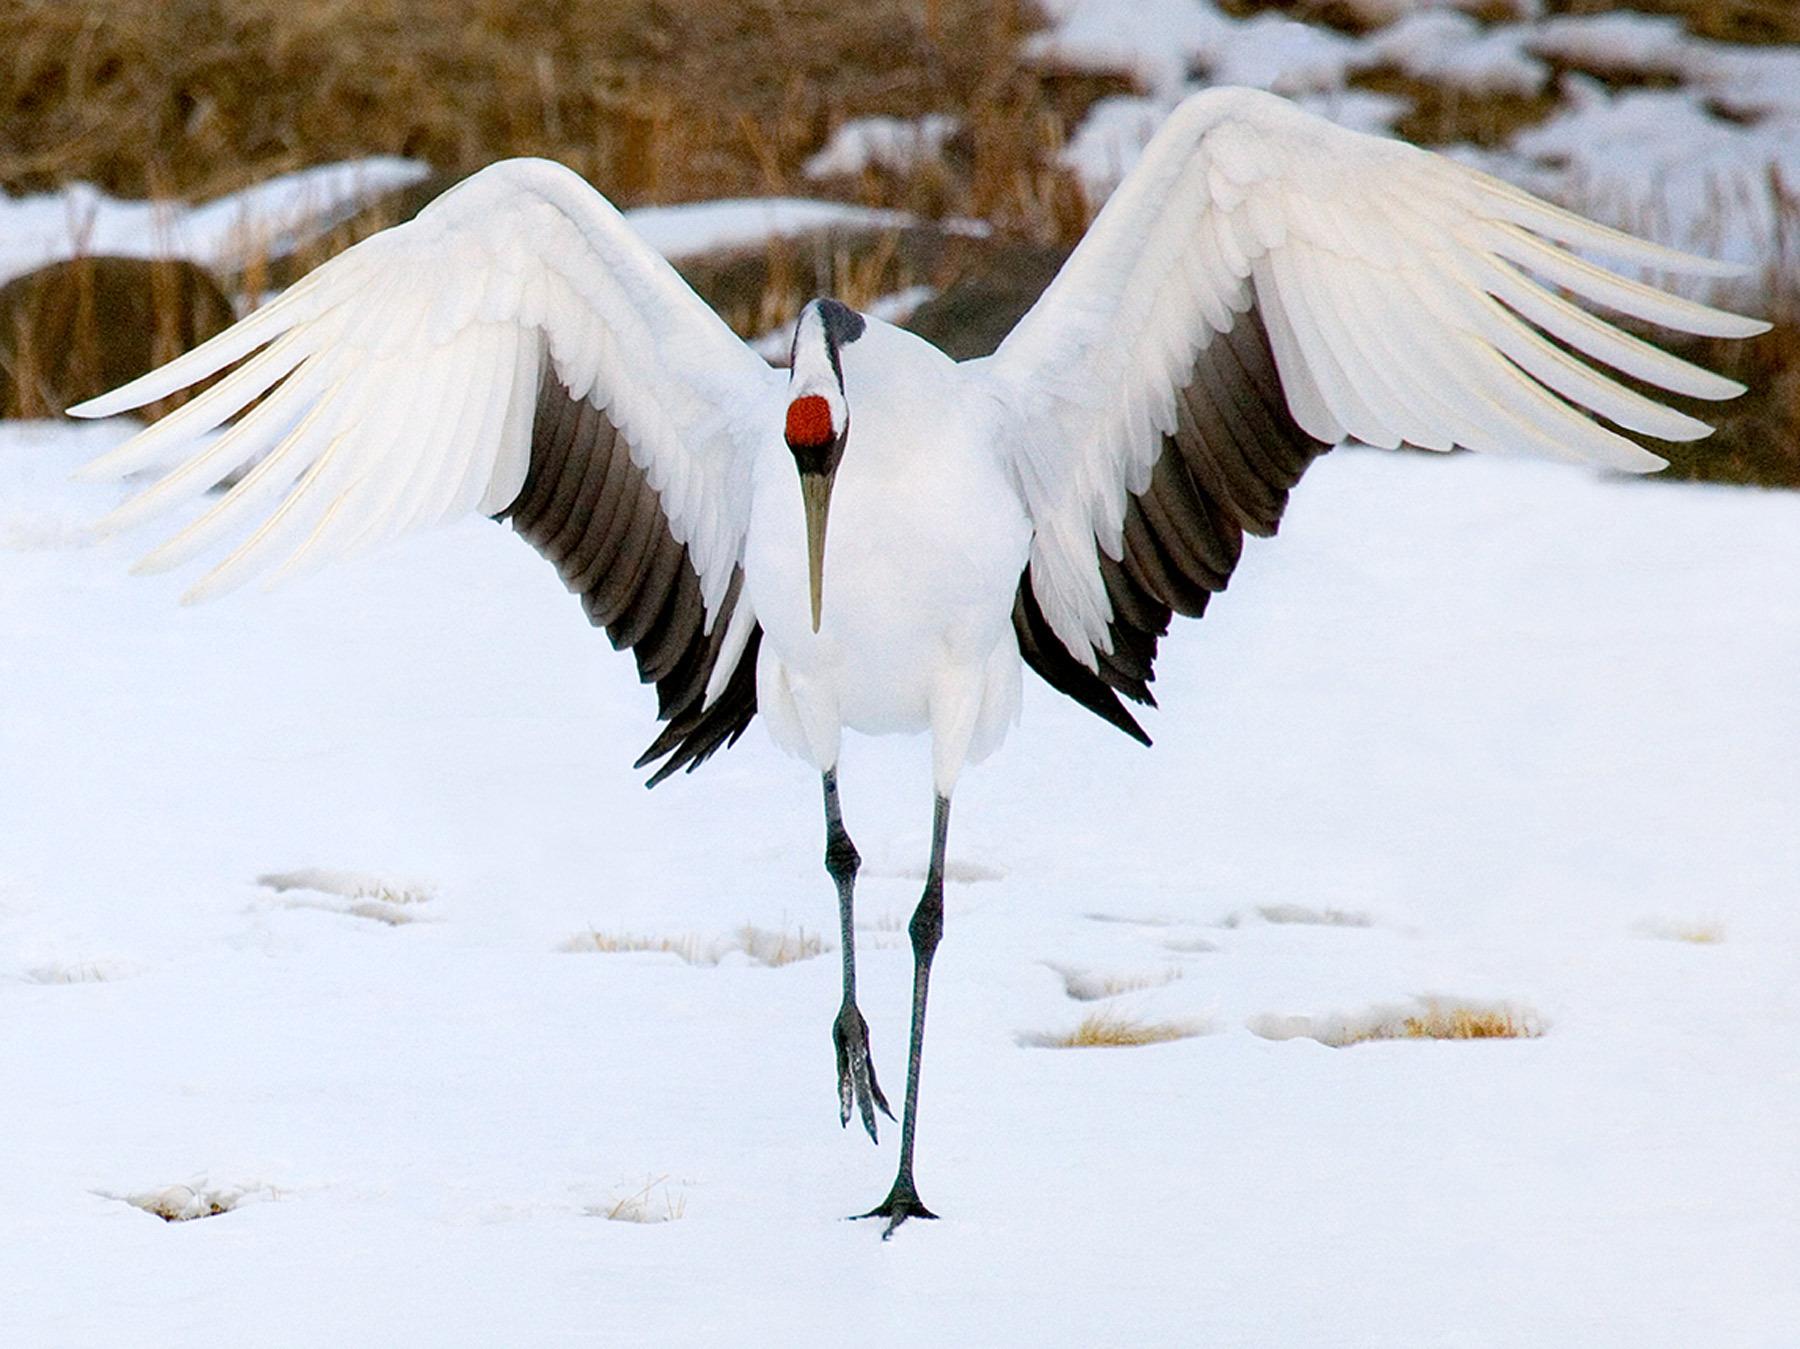 Crane Majesty I, Red-Crowned Crane, Akan Crane Center, Hokkaido,